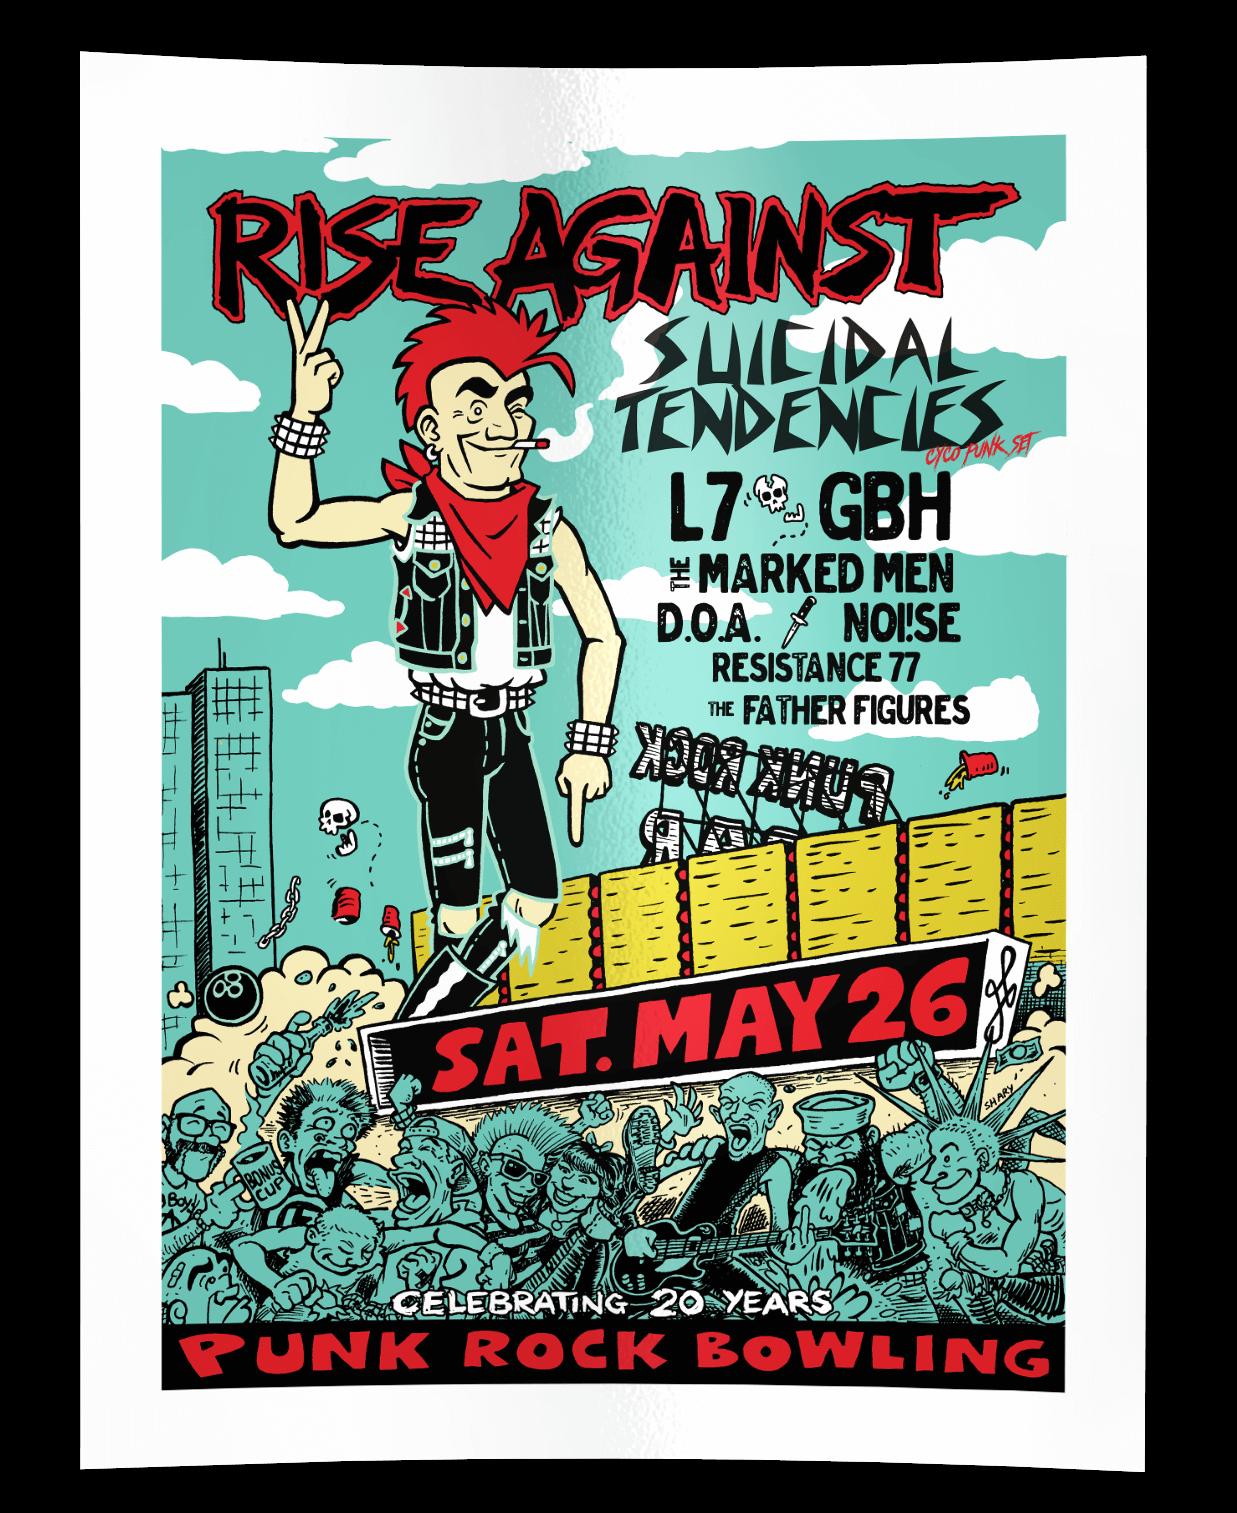 Rise Against, Suicidal Tendencies, L7, GBH